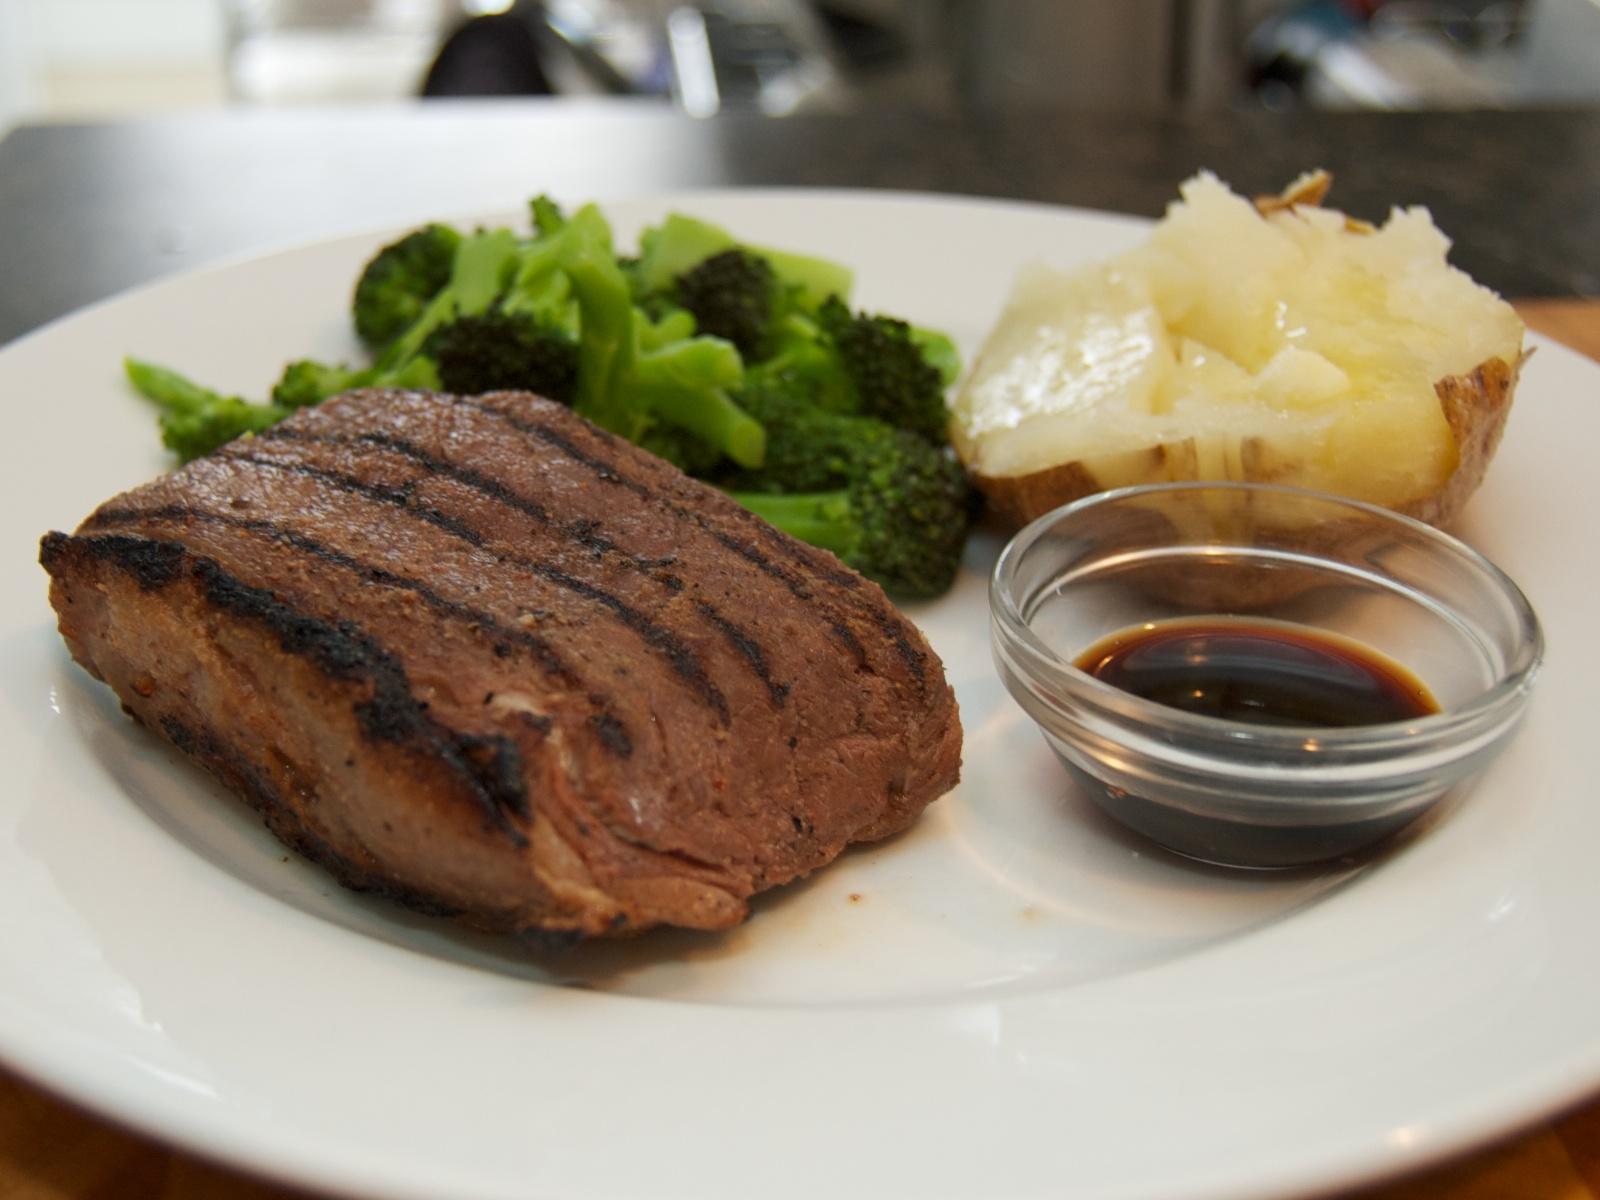 http://blog.rickk.com/food/2011/04/27/ate.2011.04.27.d.jpg